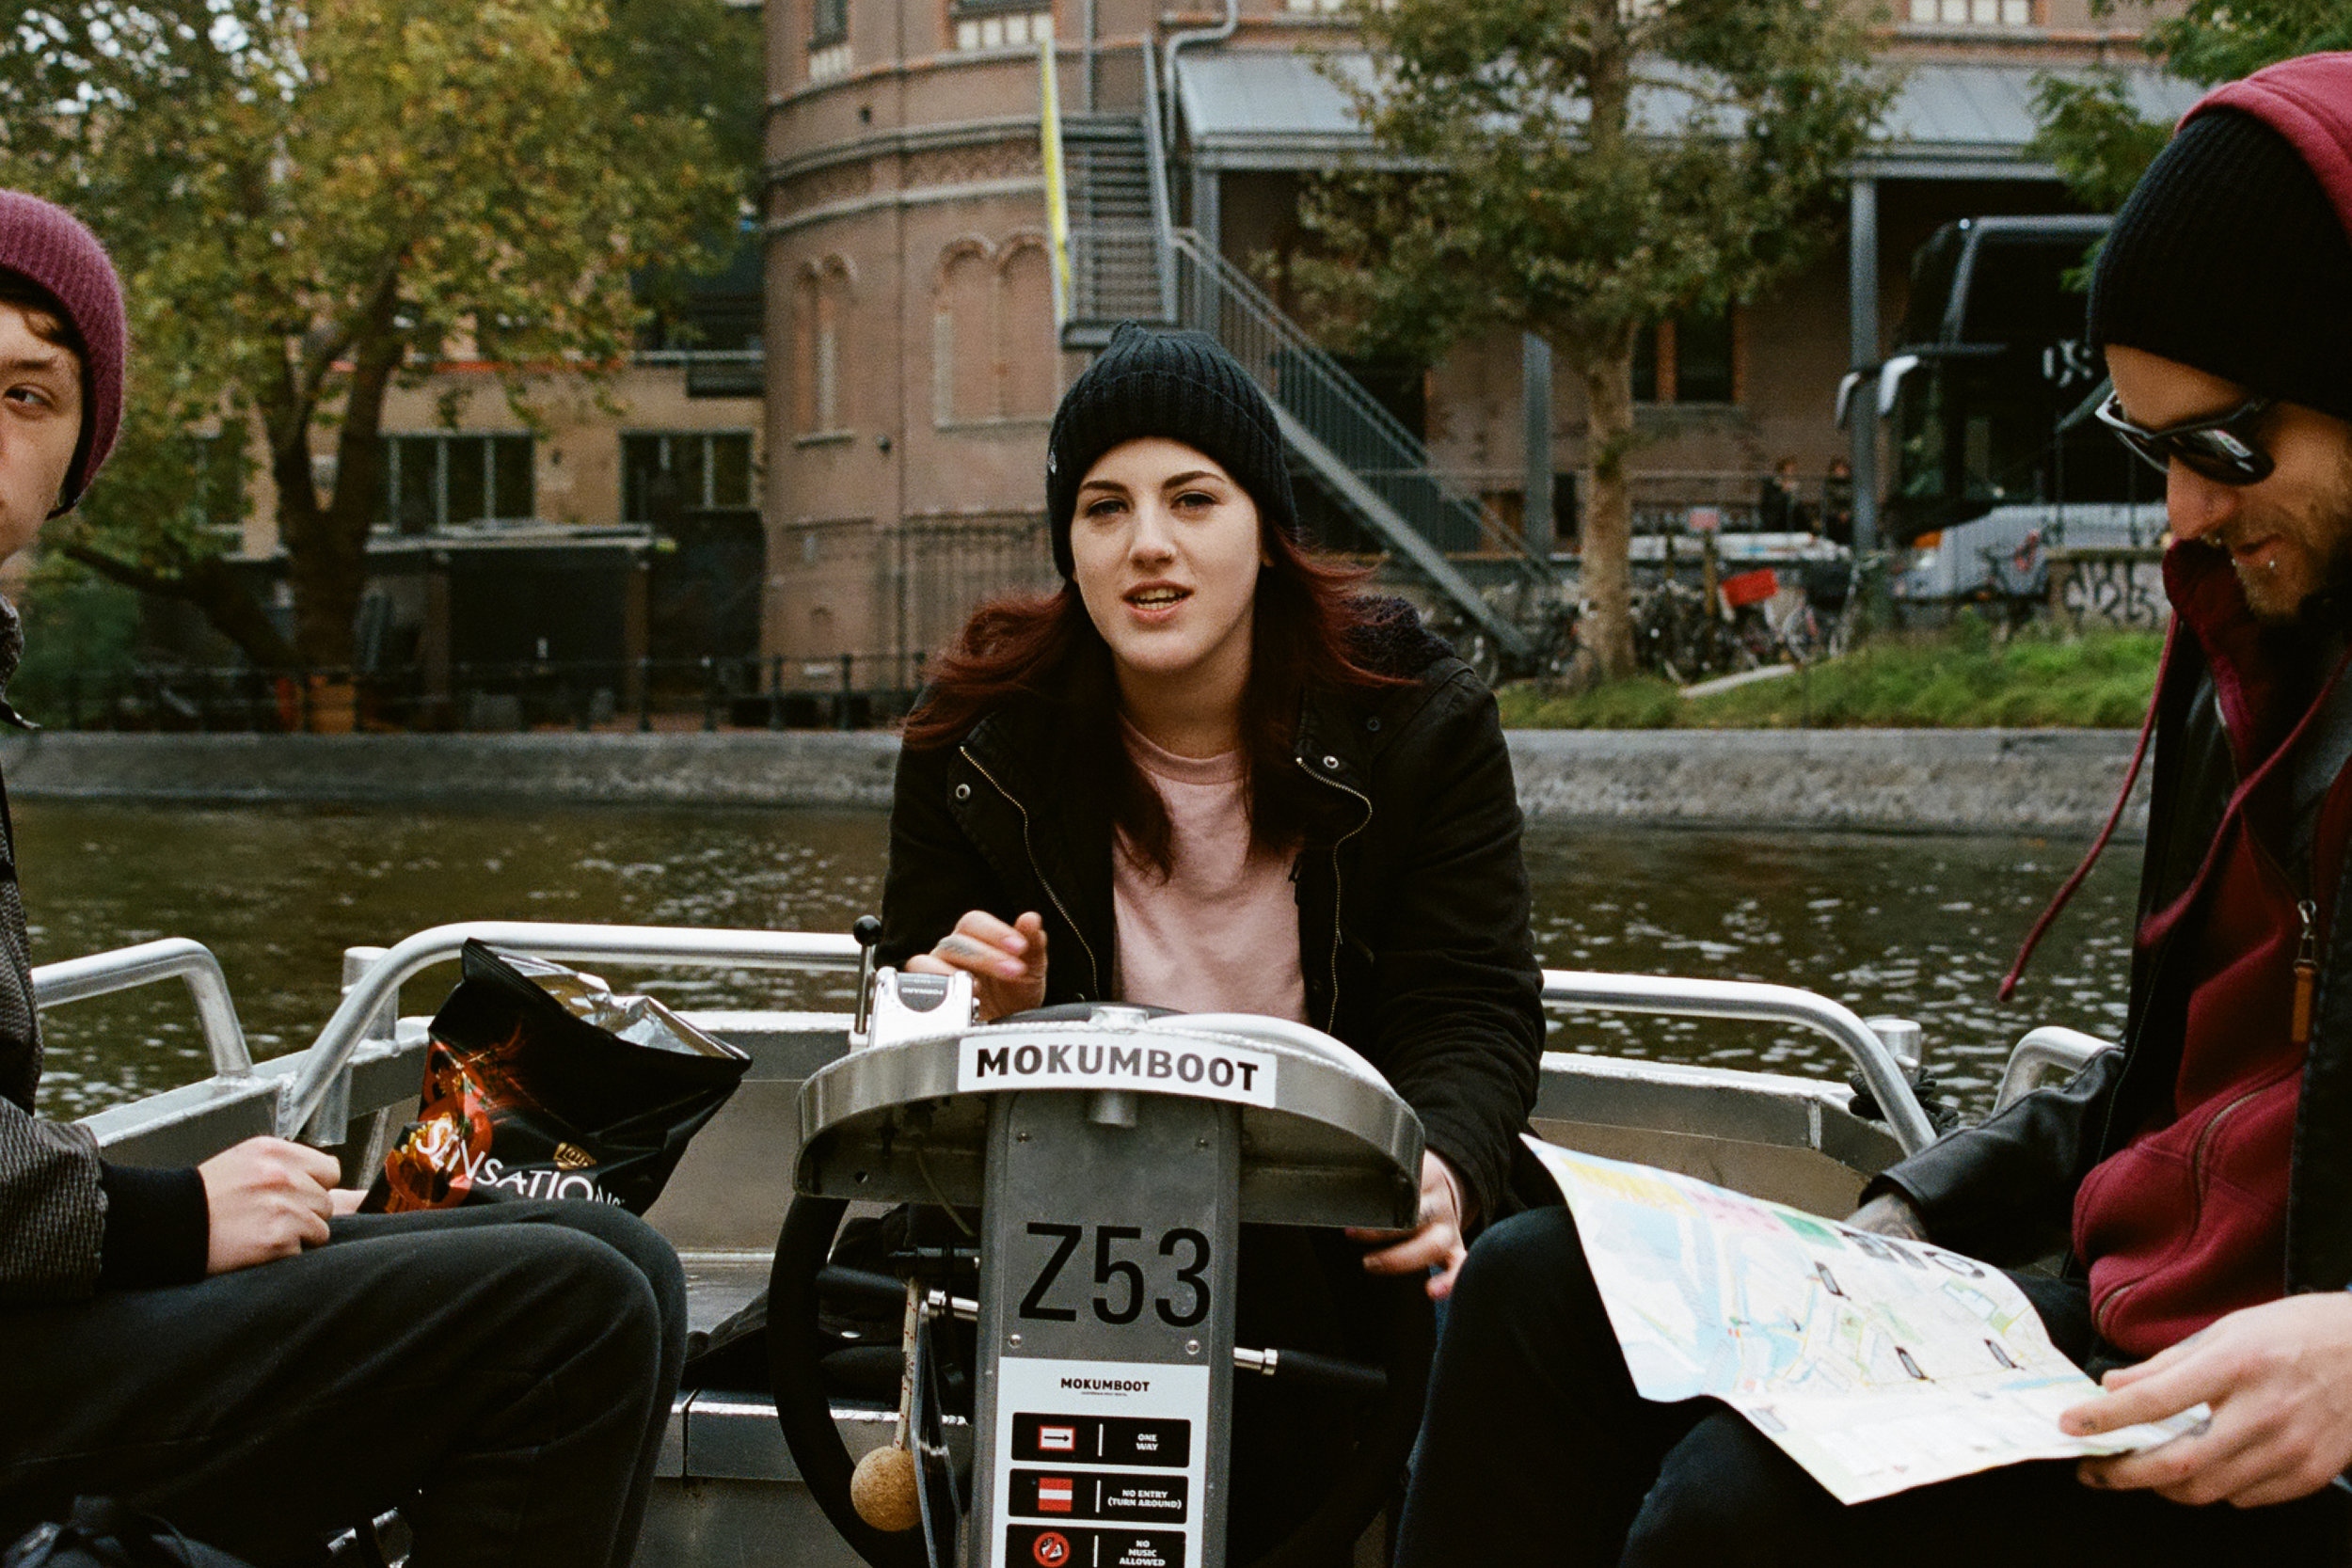 Amsterdam_0087 copy.jpg